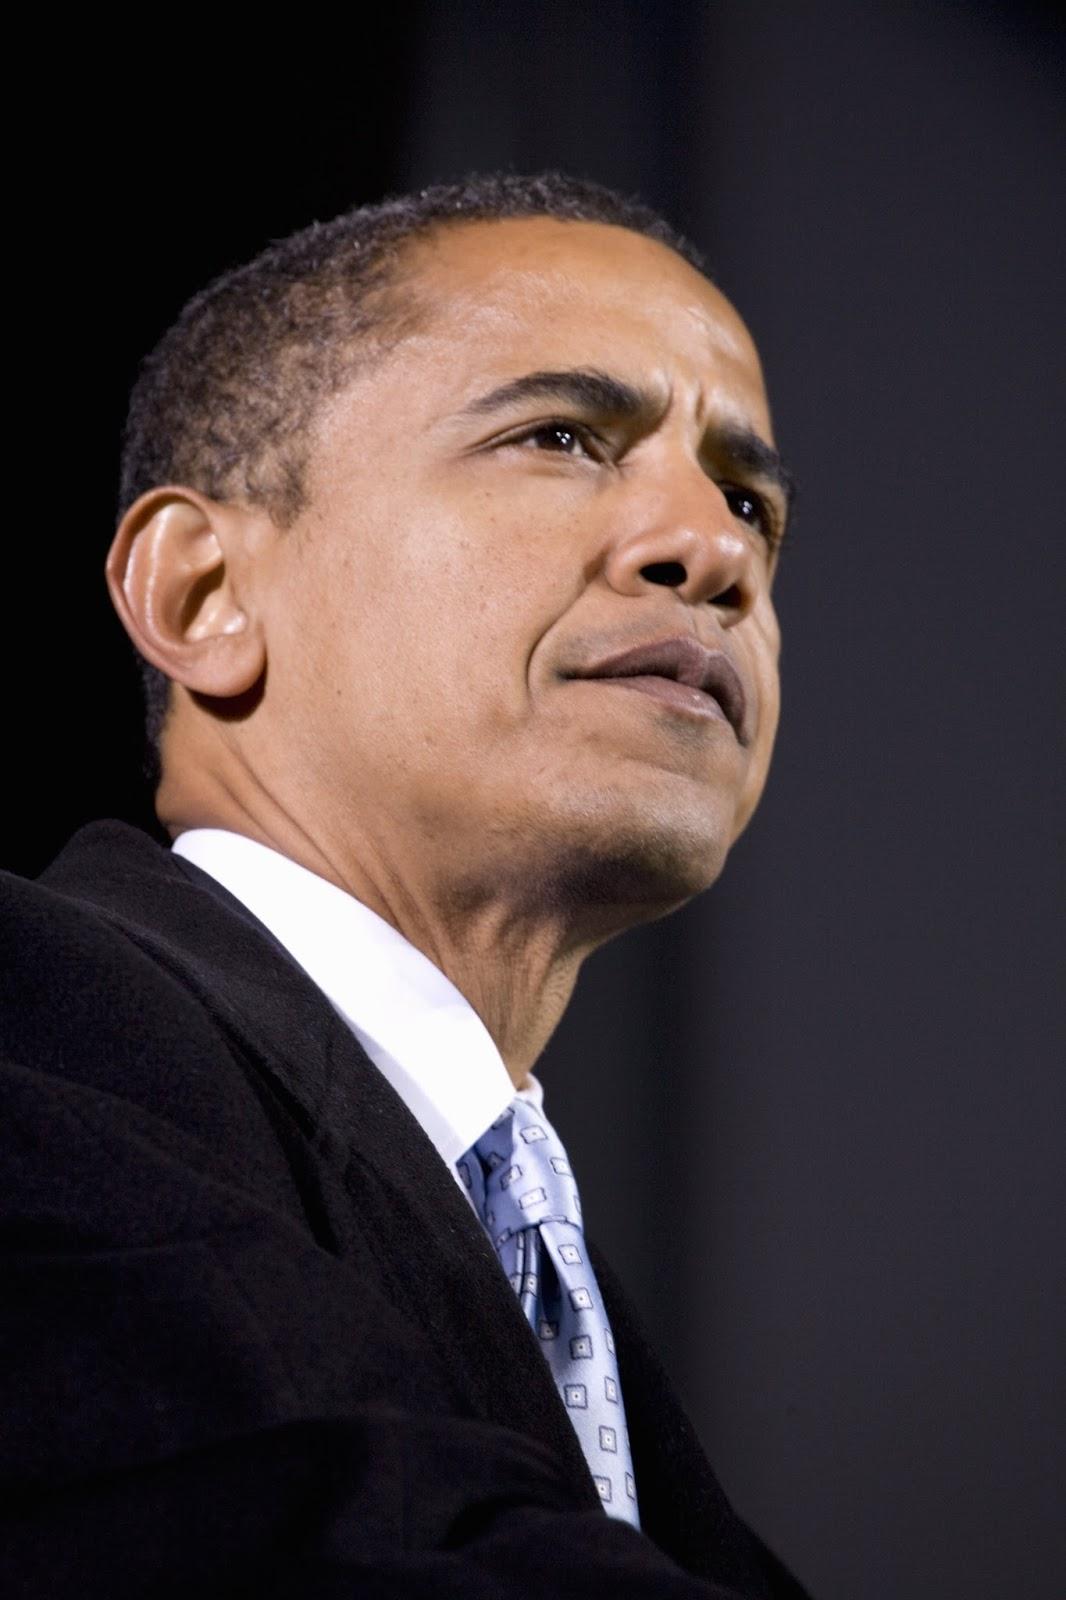 barack obama concerned face Courtesy of Joseph SohmShutterstockcom 97488074